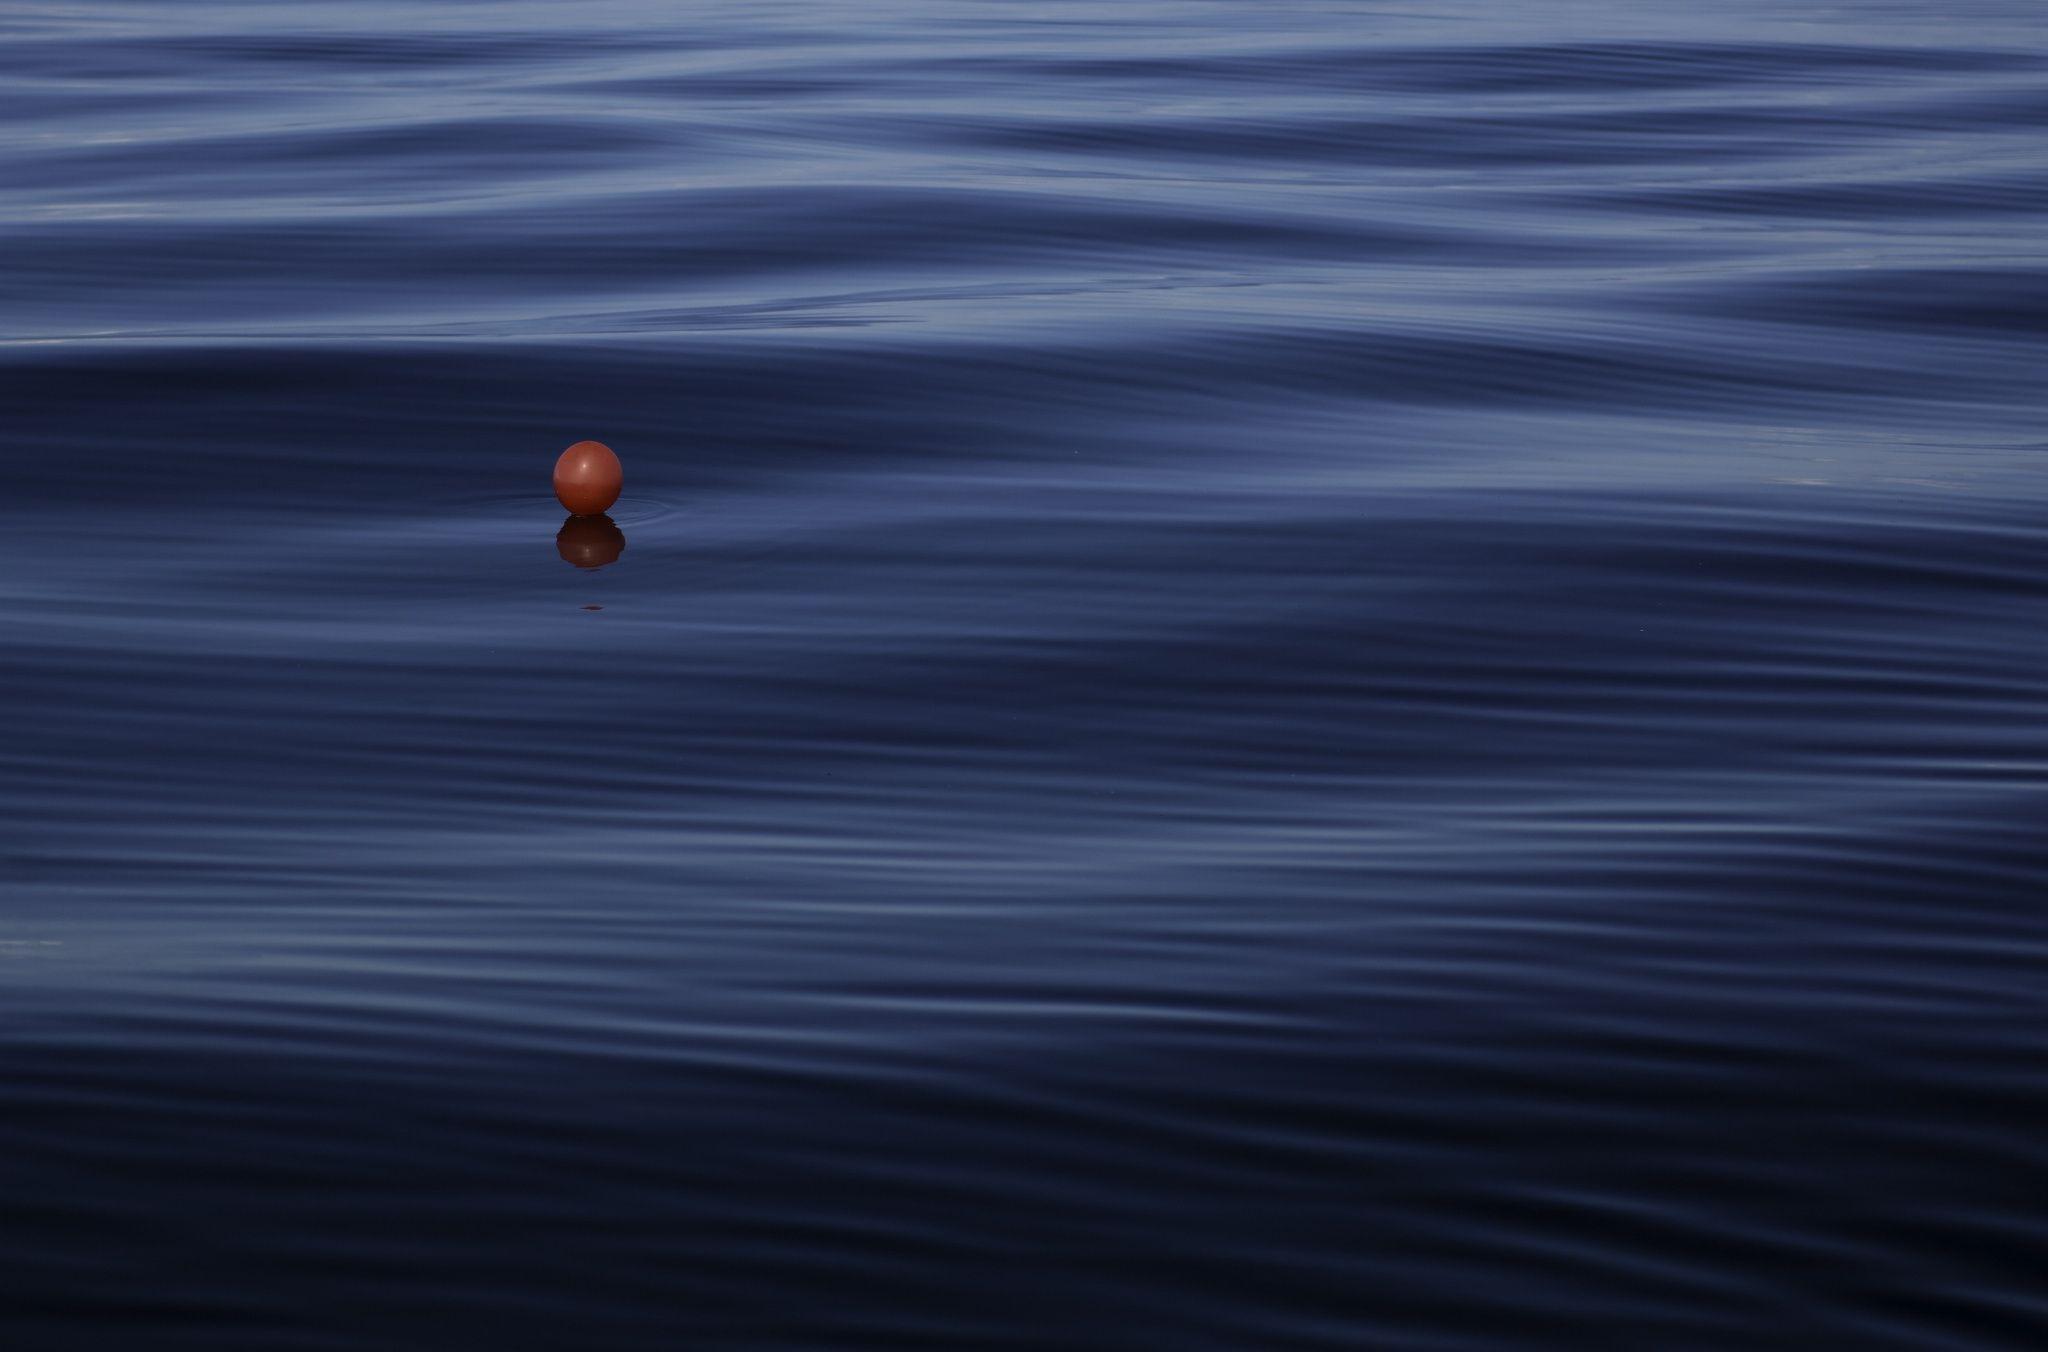 Tuna Fishing by Noah Rosen on 500px